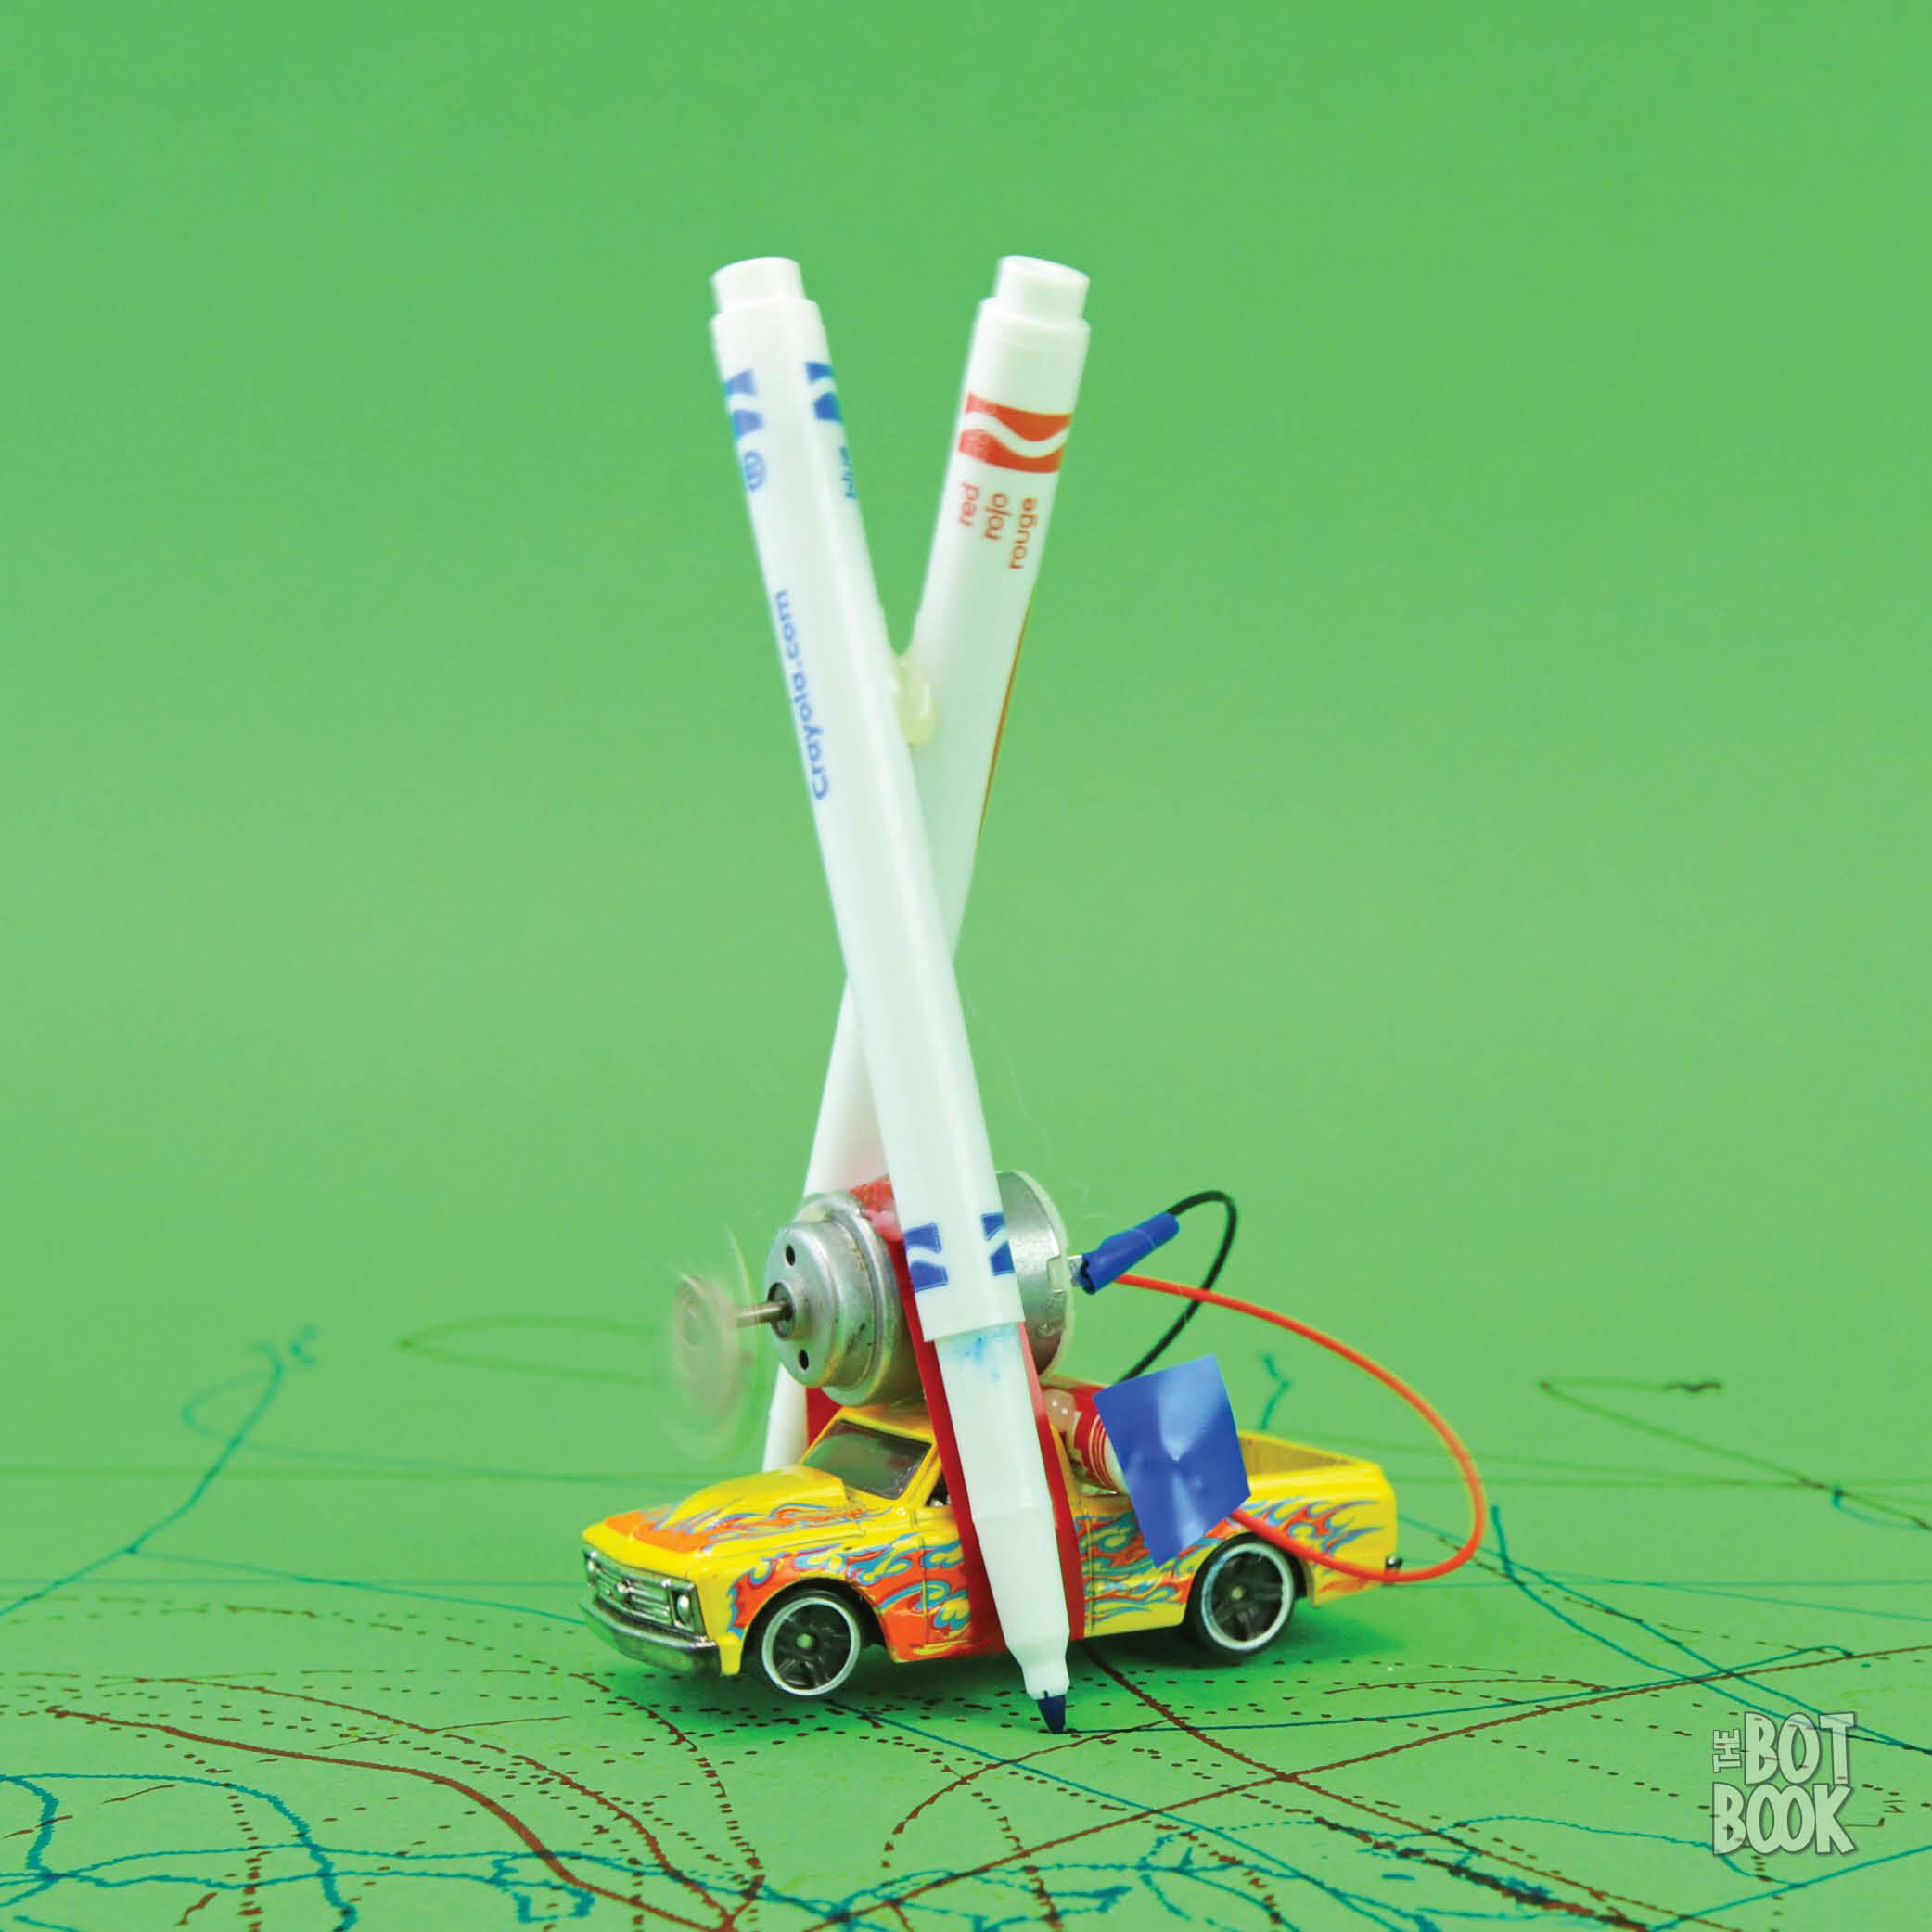 Toy Car Marker Bot